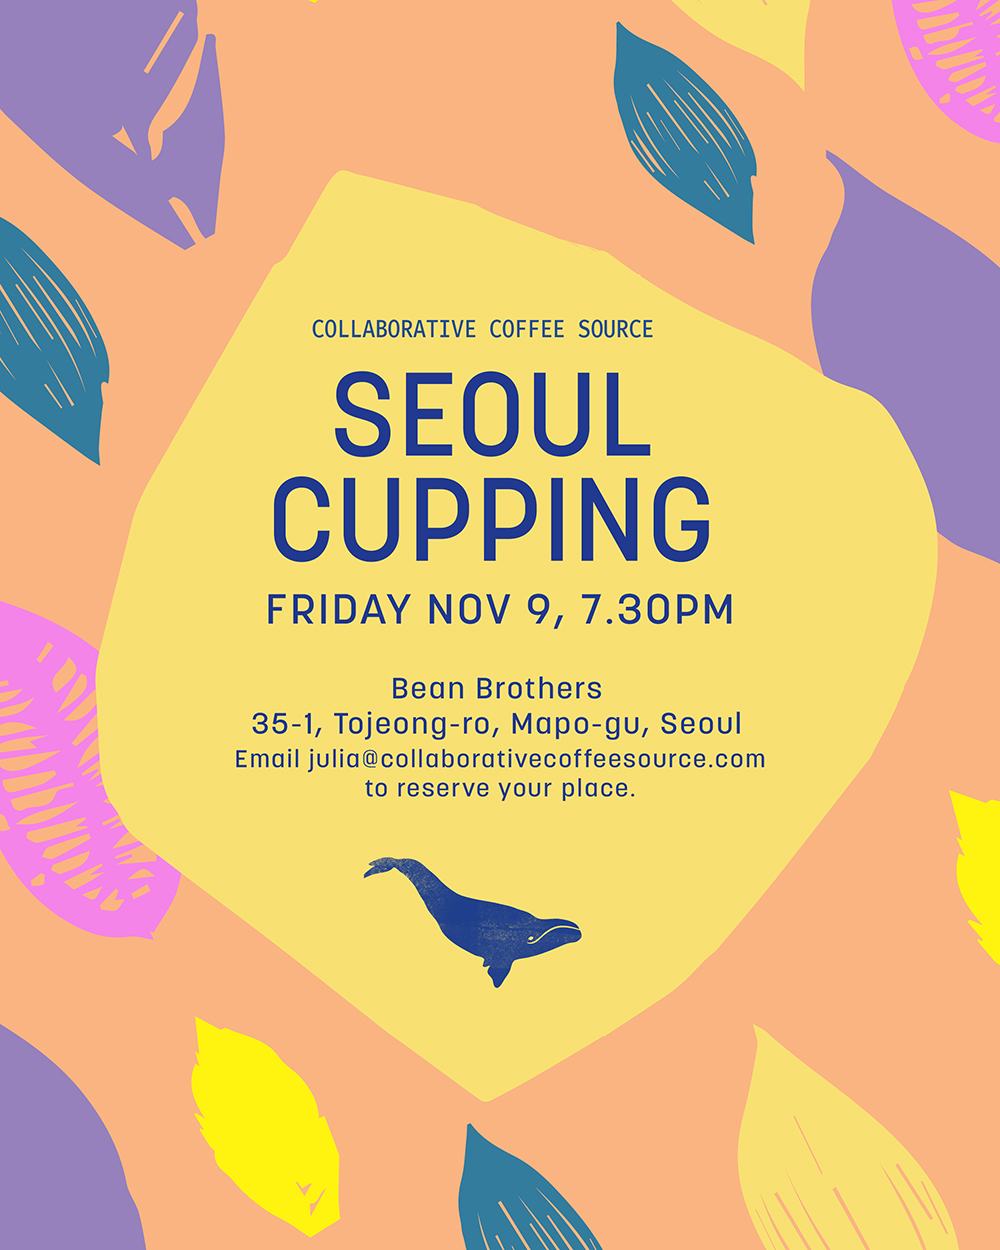 Seoul Cupping sm.jpg